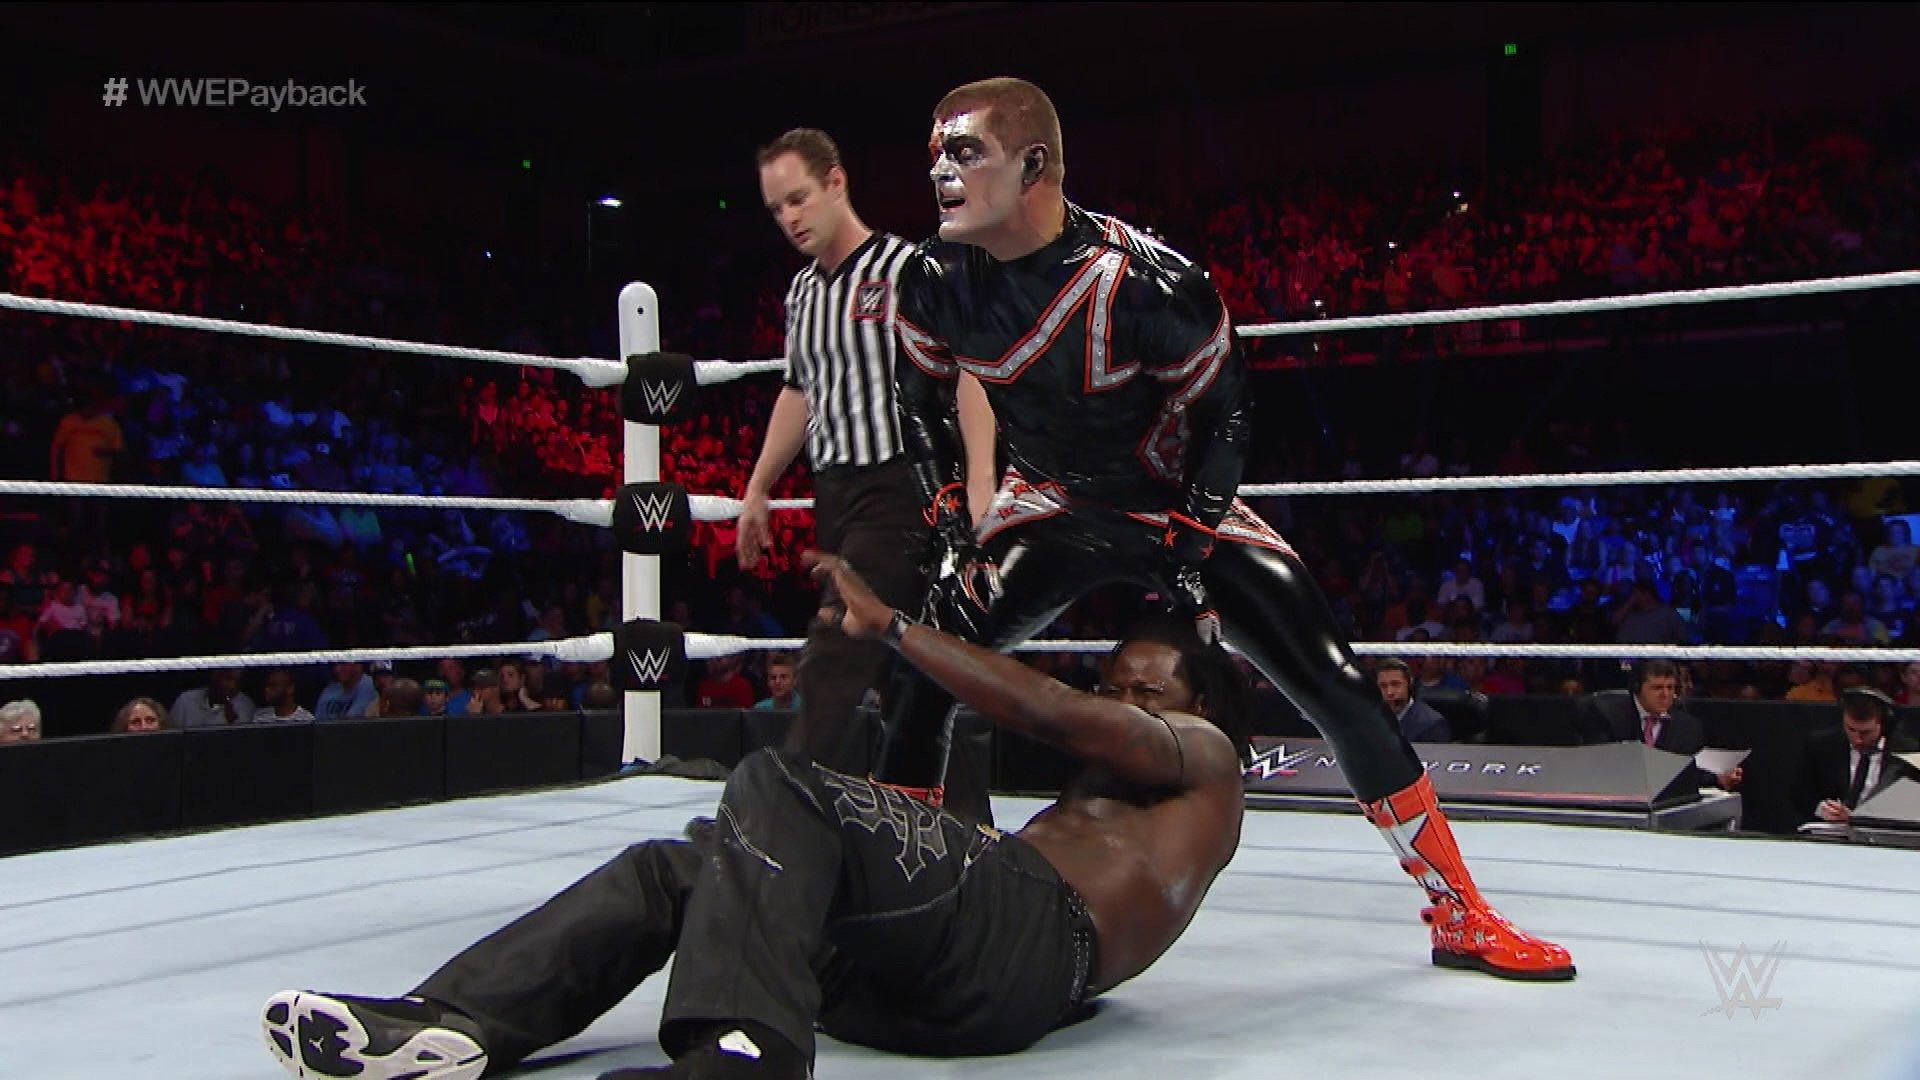 Vidéos exclusives de WWE Payback 2015